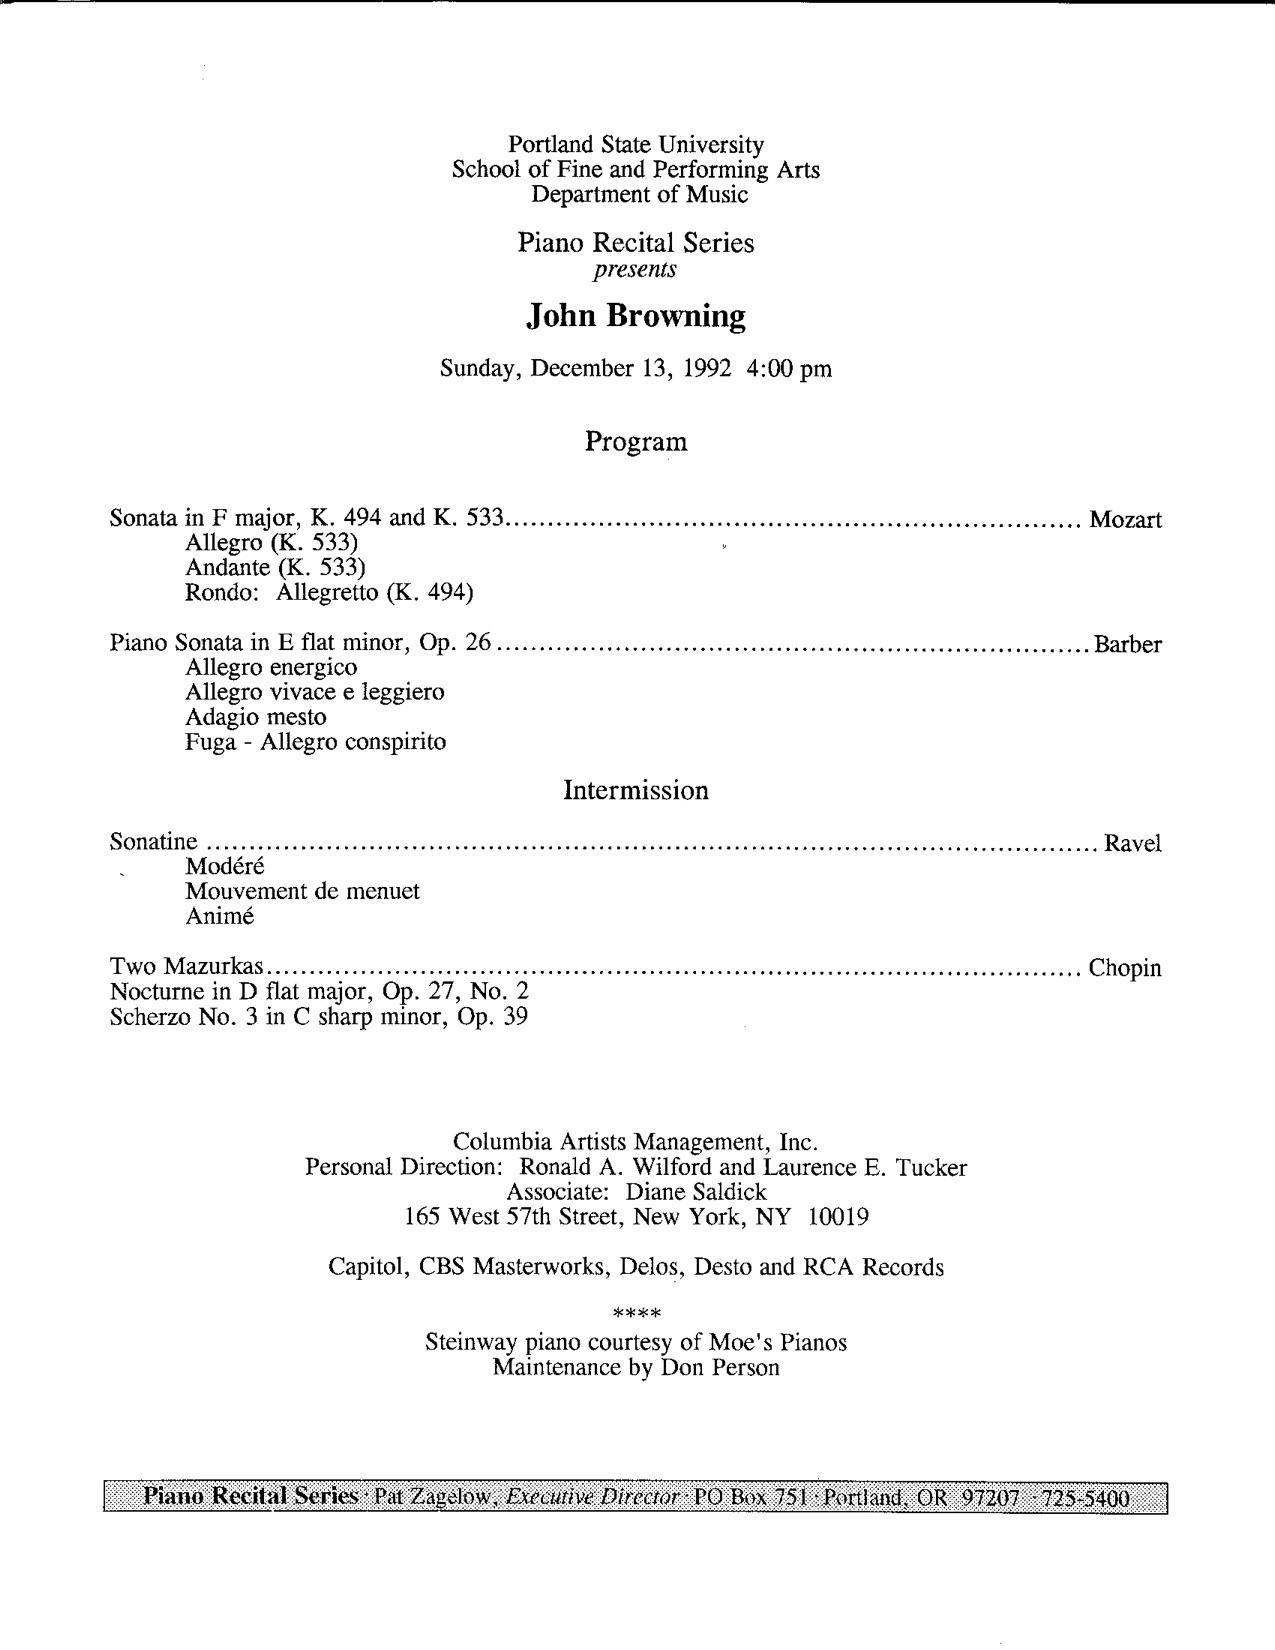 Browning92-93_Program2.jpg